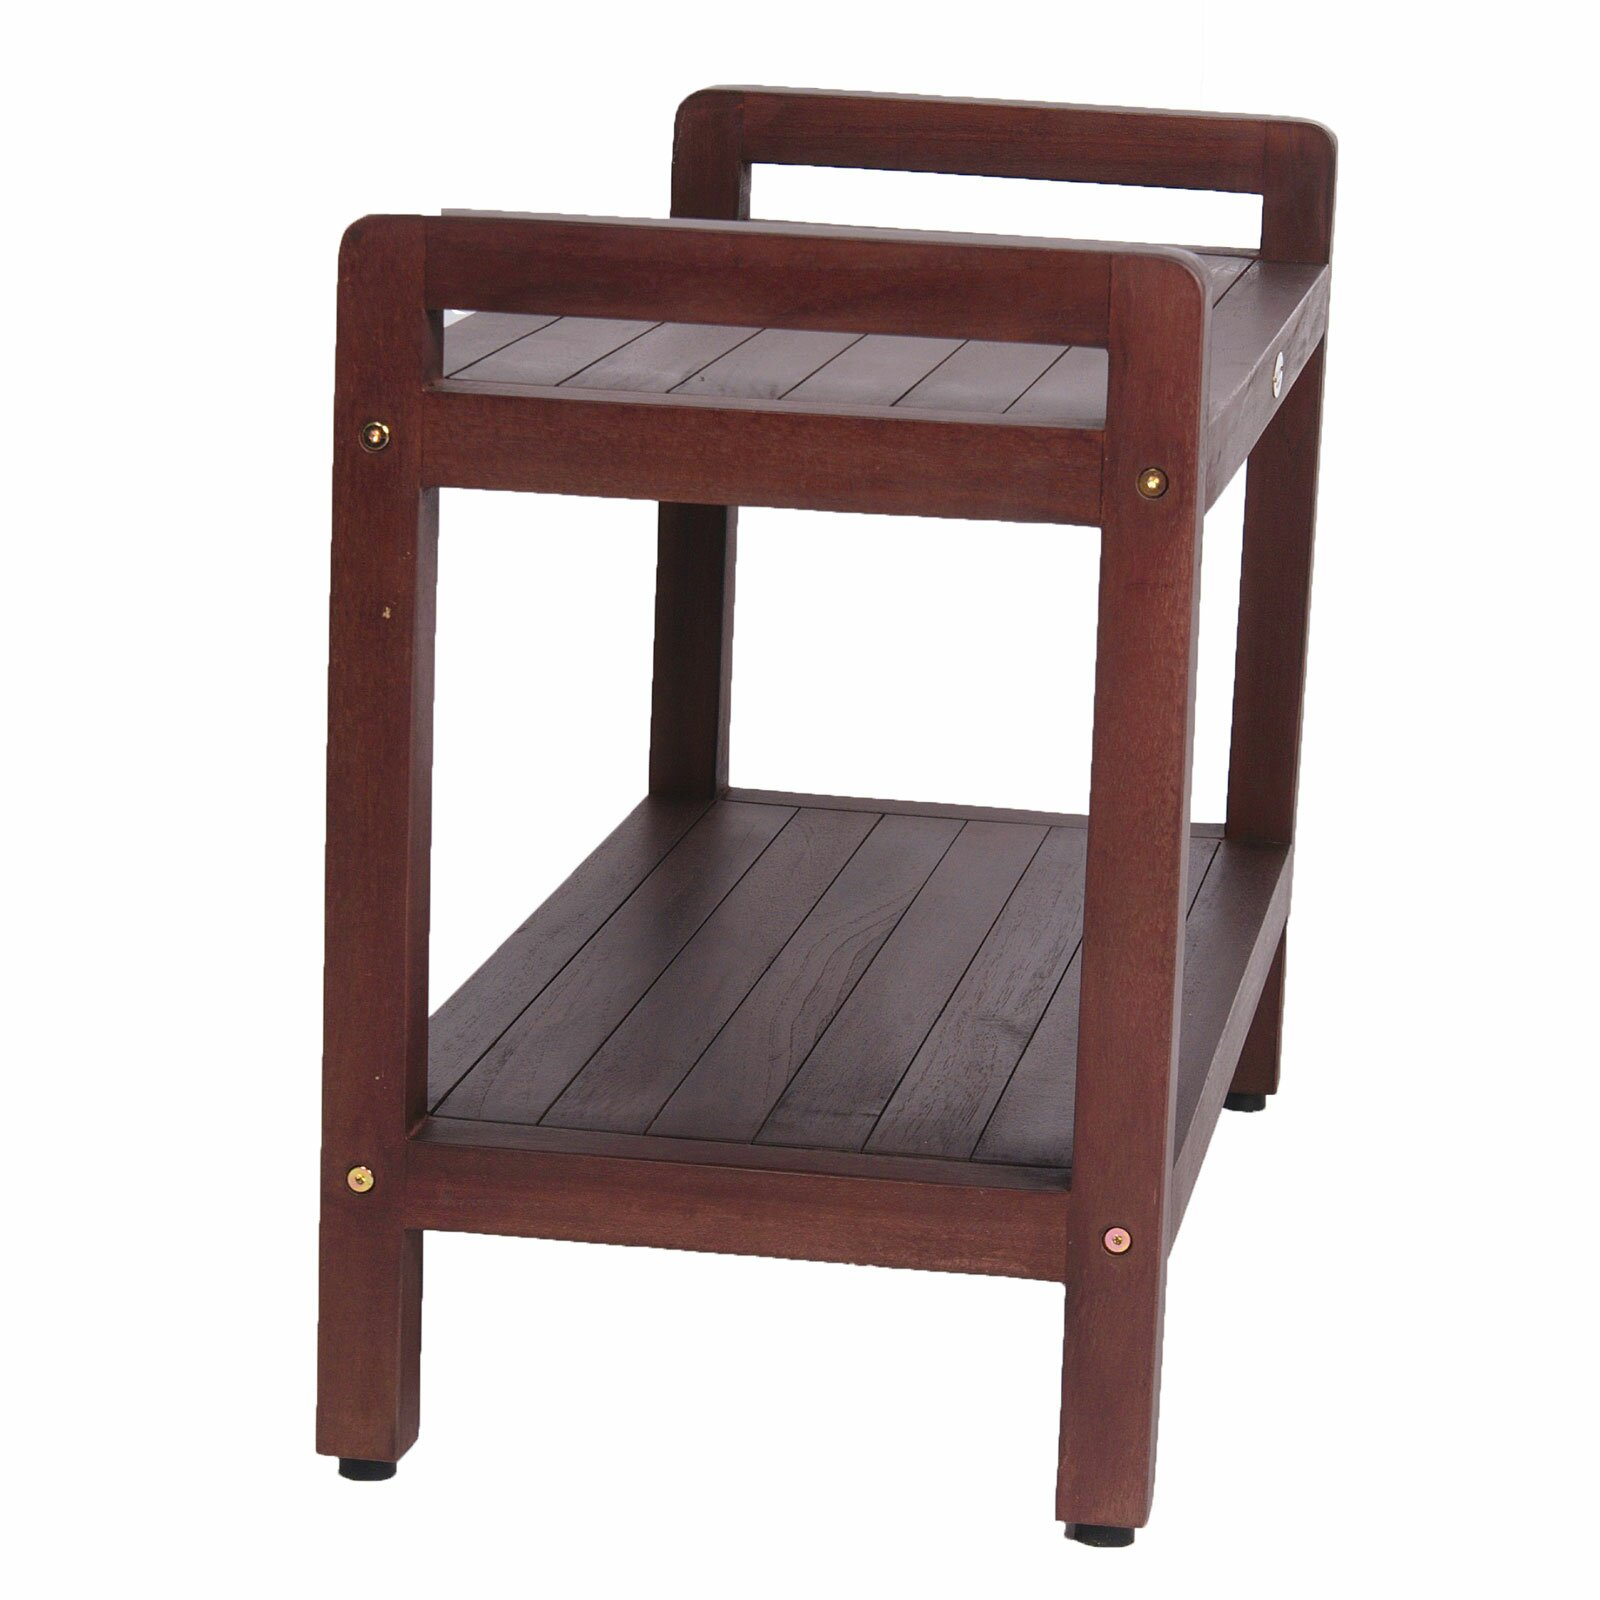 Decoteak Lift Aide Ergonomic Teak Spa Shower Bench